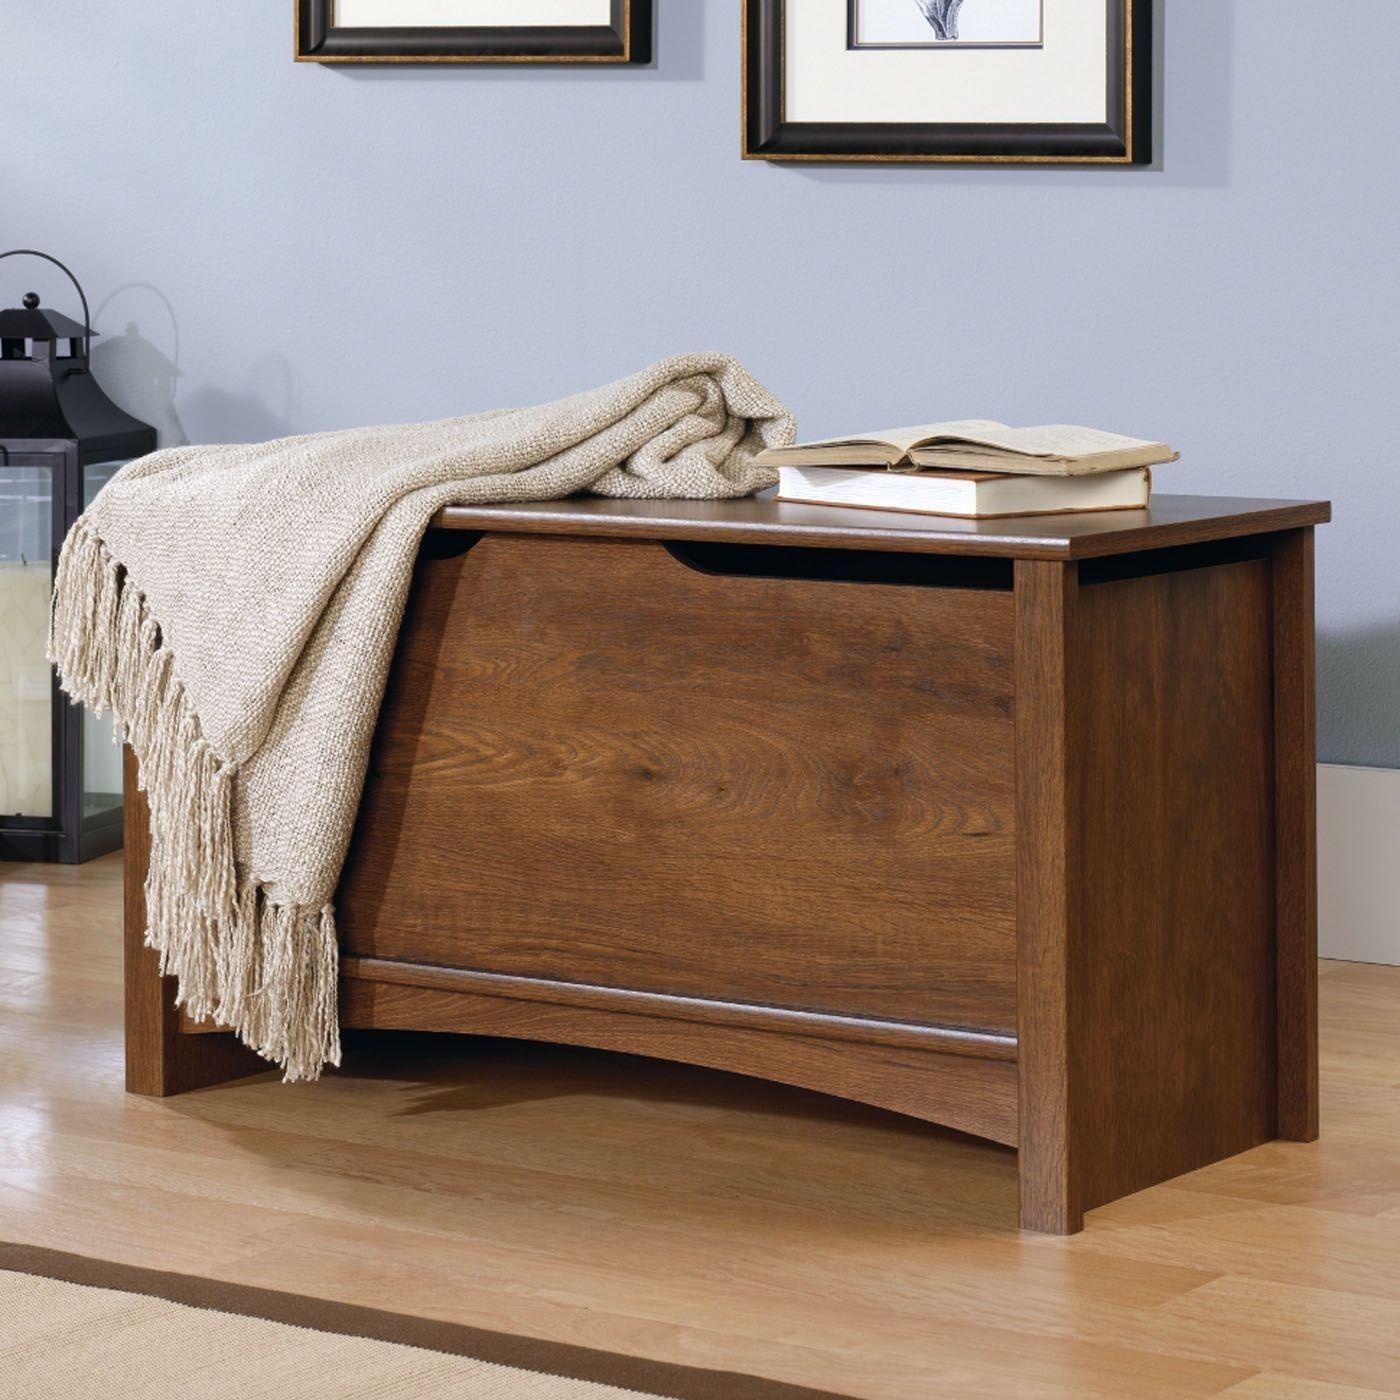 Hallway storage trunk  Dressers  Shoal Creek Storage Chest  Shopko  furniture